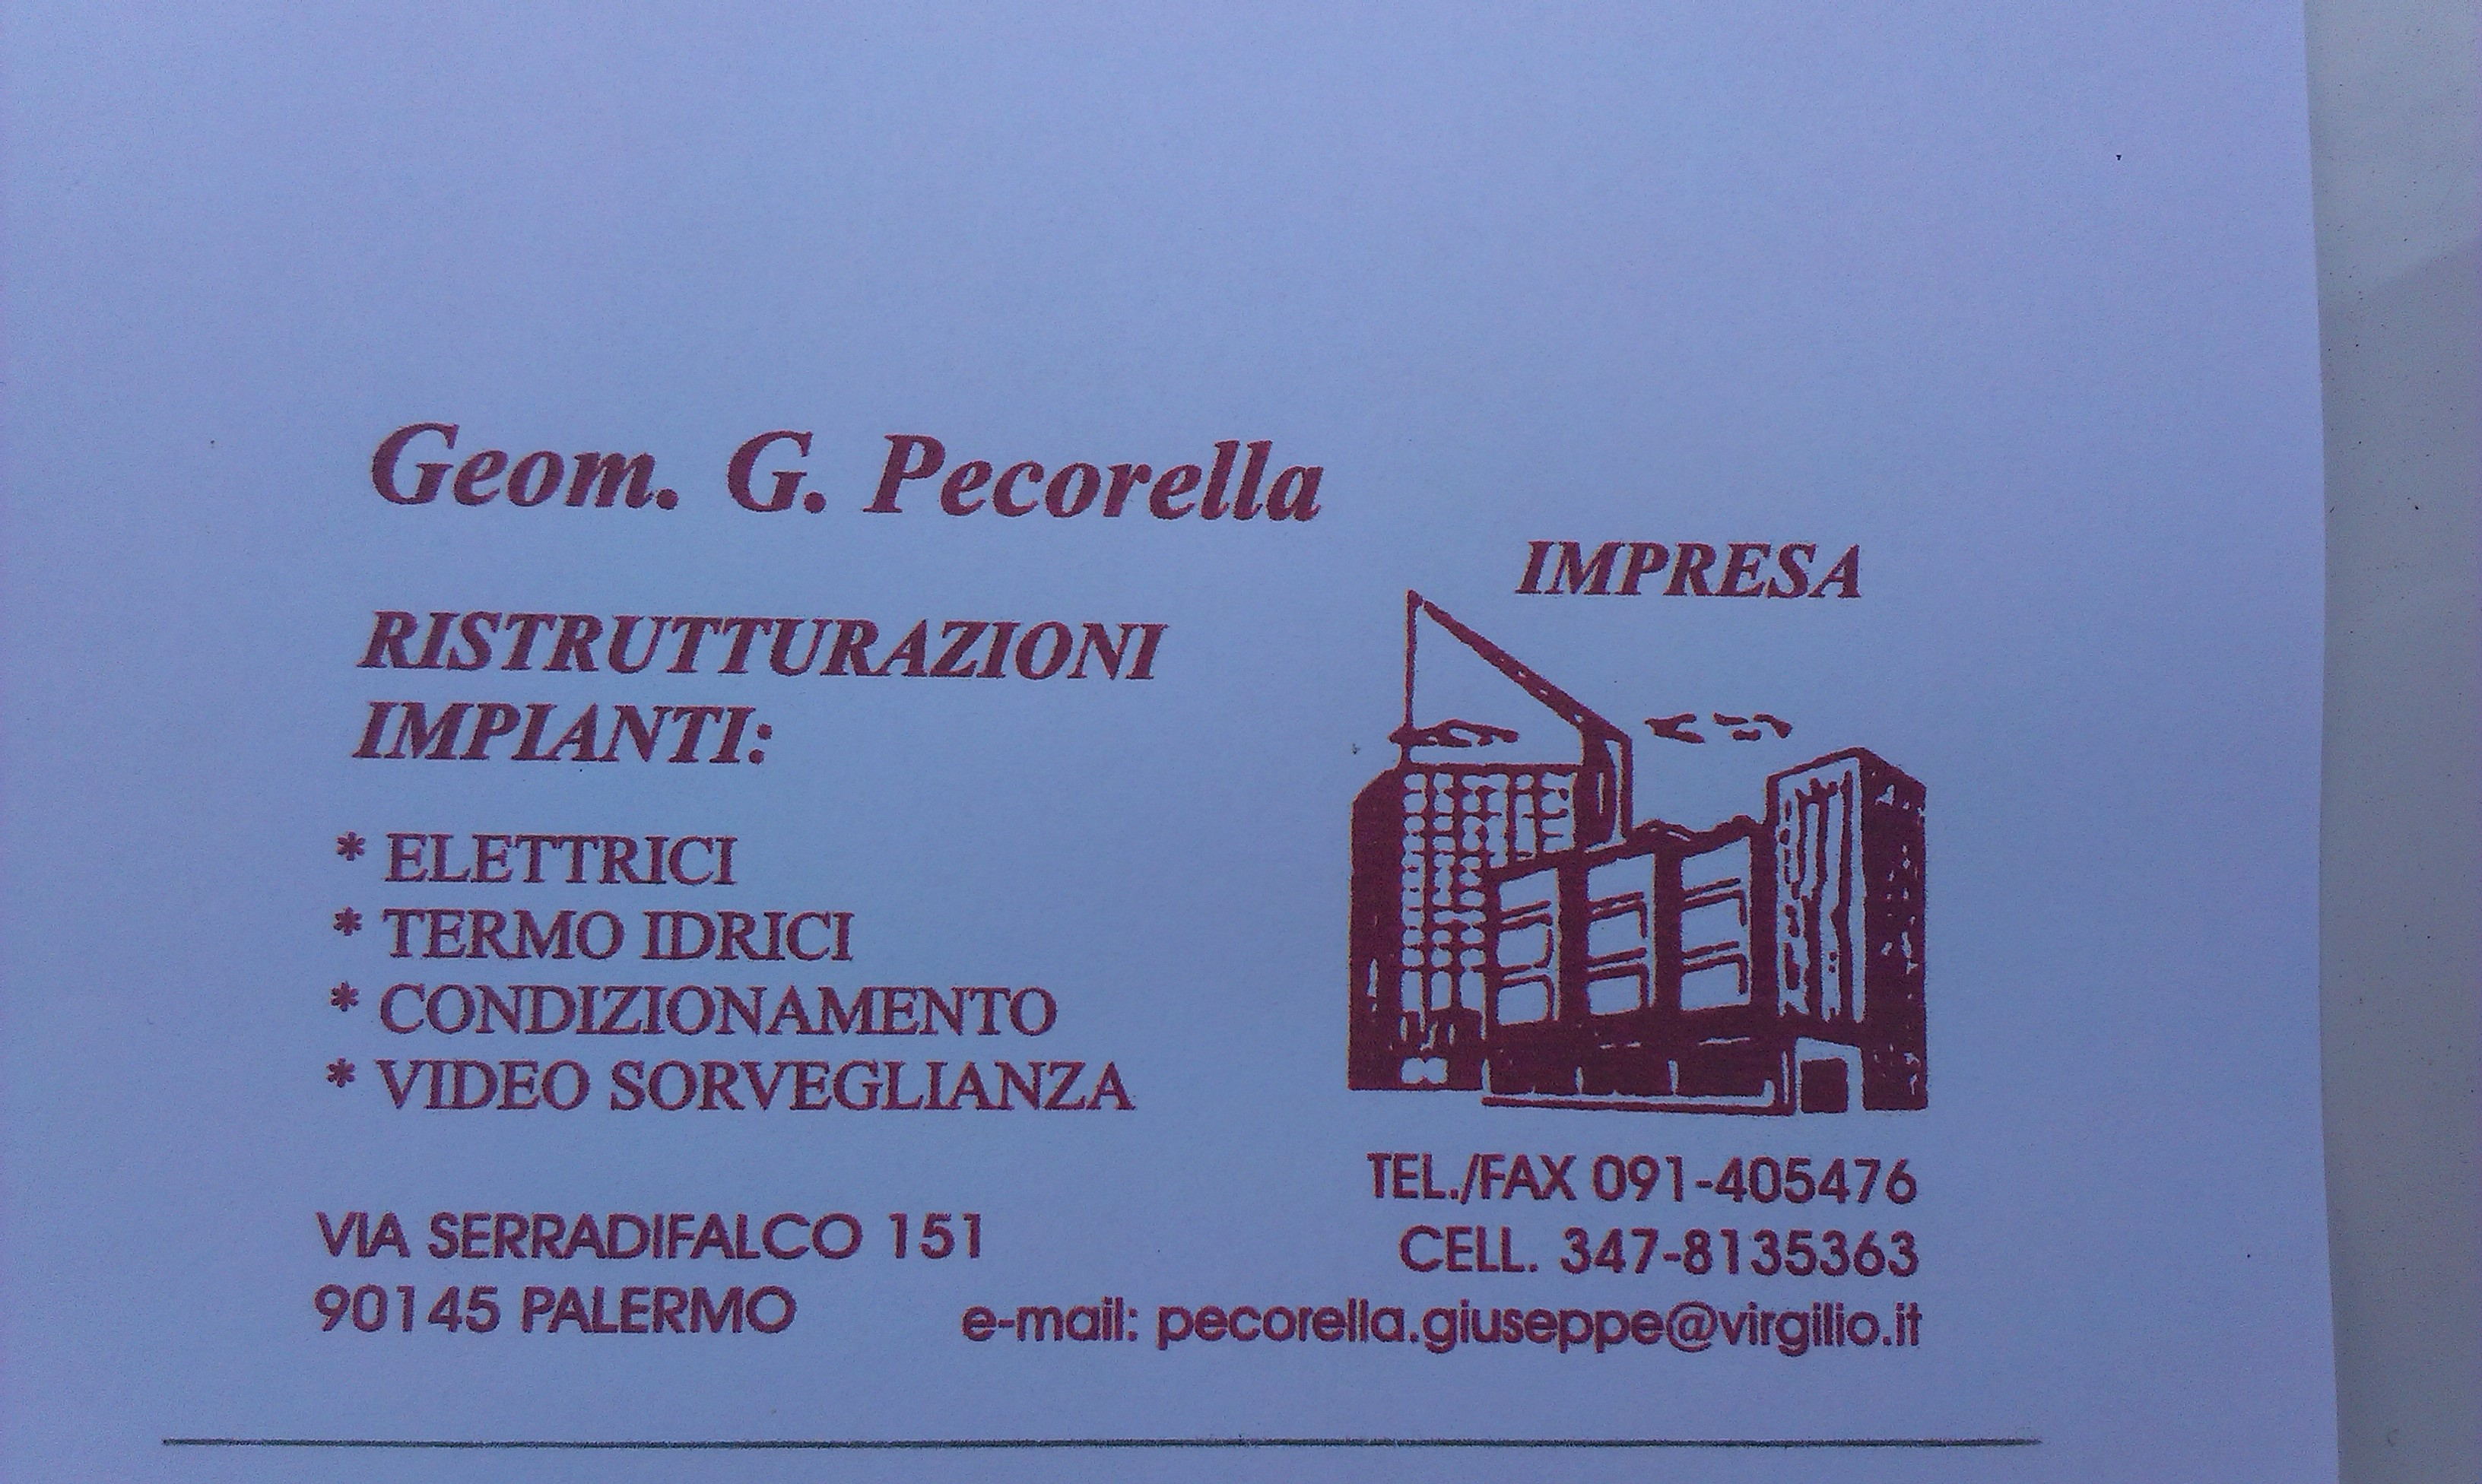 Pecorella Geom. Giuseppe